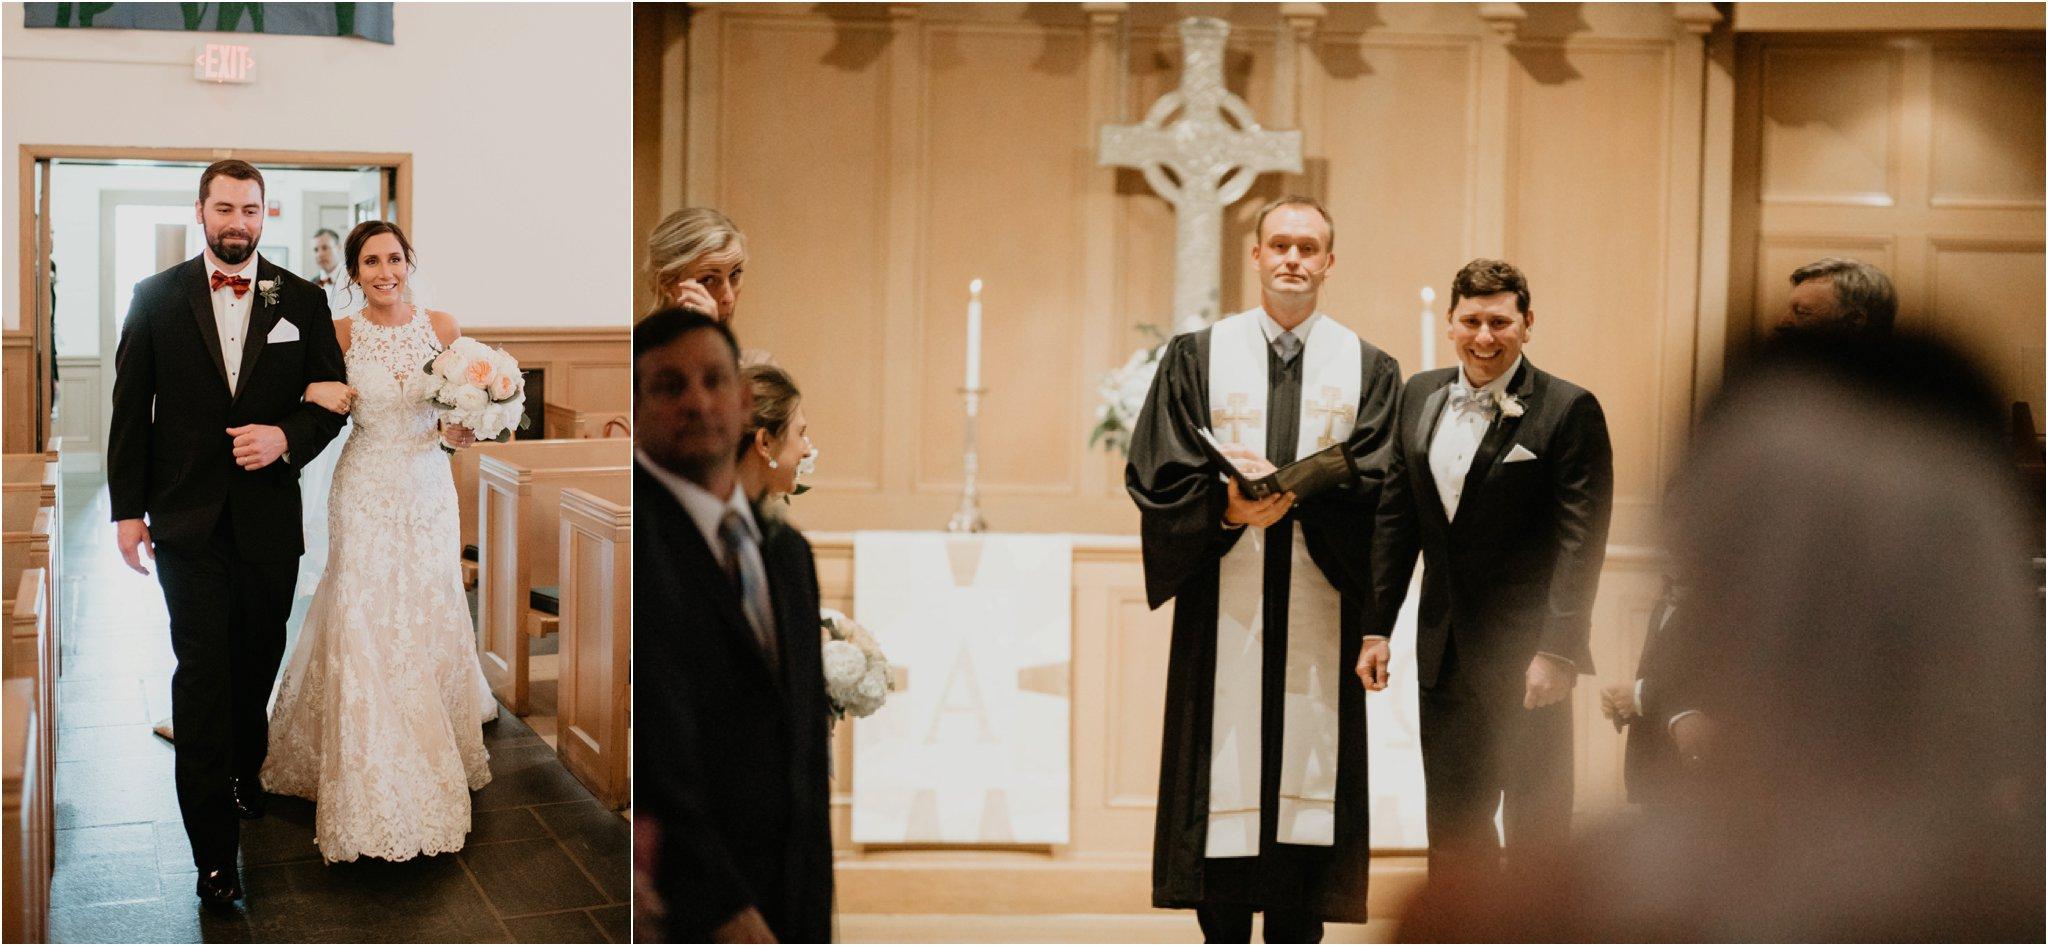 Patrick Henry Ballroom - Weddings - Virginia Wedding Photographer - Pat Cori Photography-68.jpg